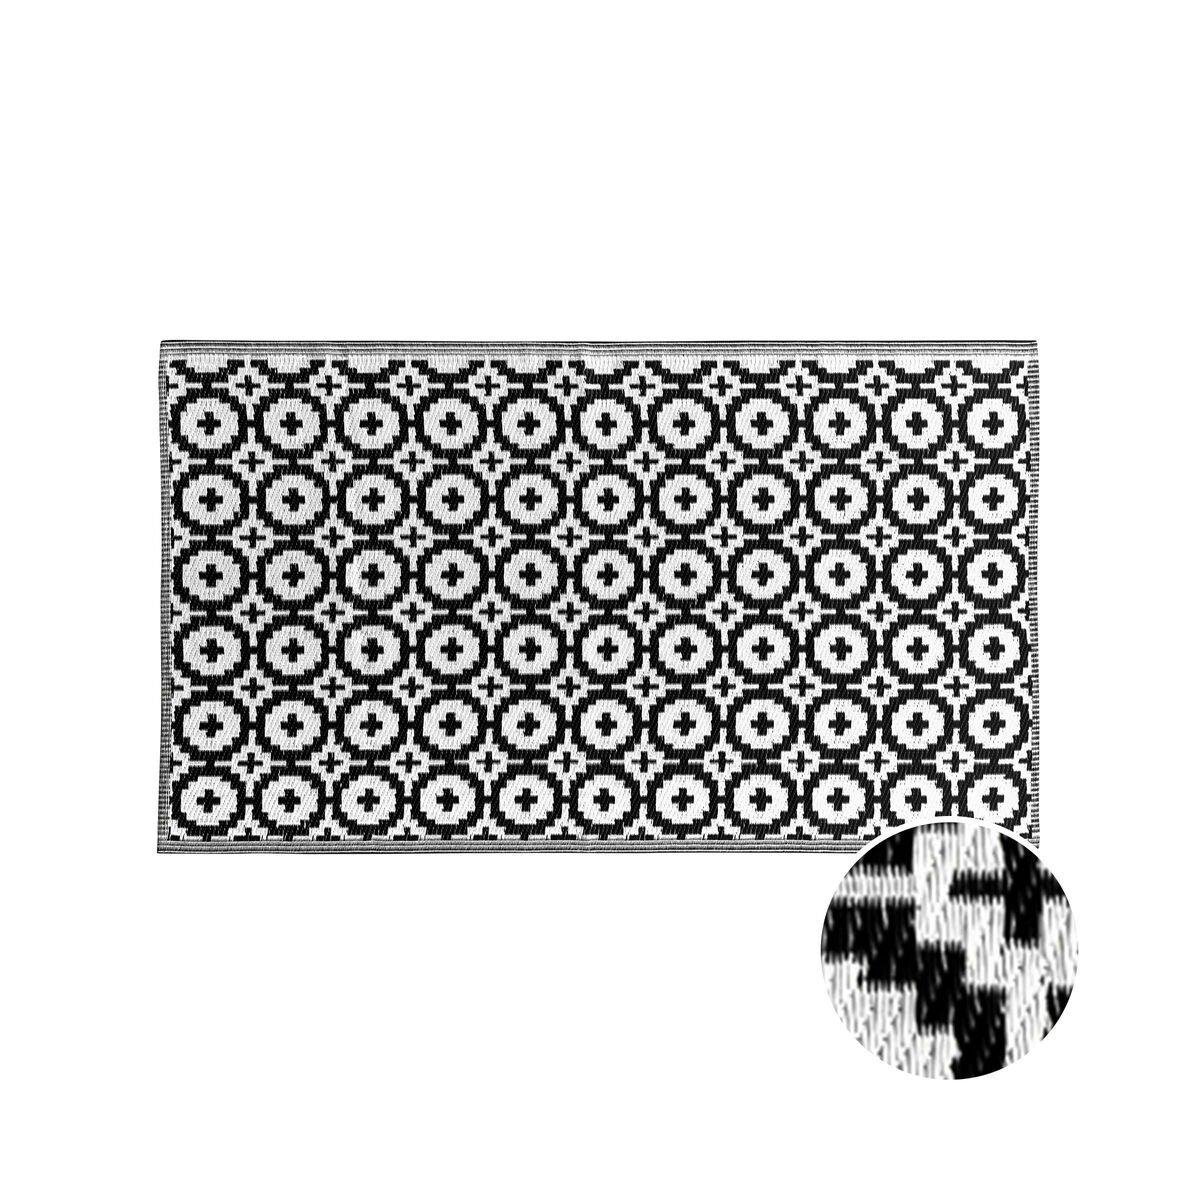 Full Size of Outdoor Teppich Mosaik Schwarz Wei 150x90cm Butlers Sofa Grau Weiß Offenes Regal Bad Hängeschrank Bett Holz Für Küche Betten Wohnzimmer Weißes 140x200 Wohnzimmer Teppich Schwarz Weiß